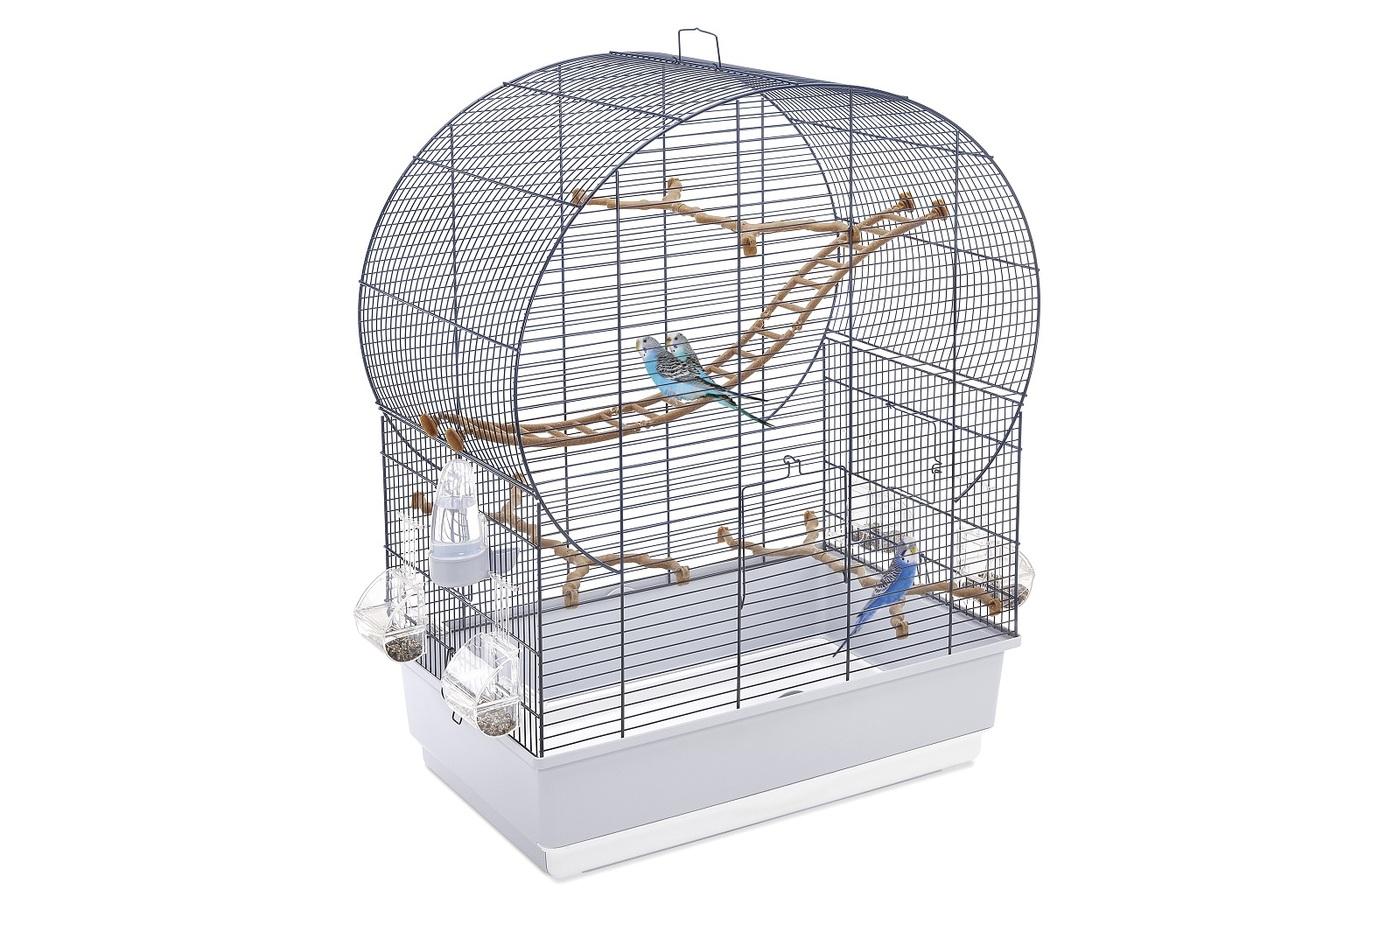 клетка imac andorra для птиц , морозный голубой, 61х38х76см